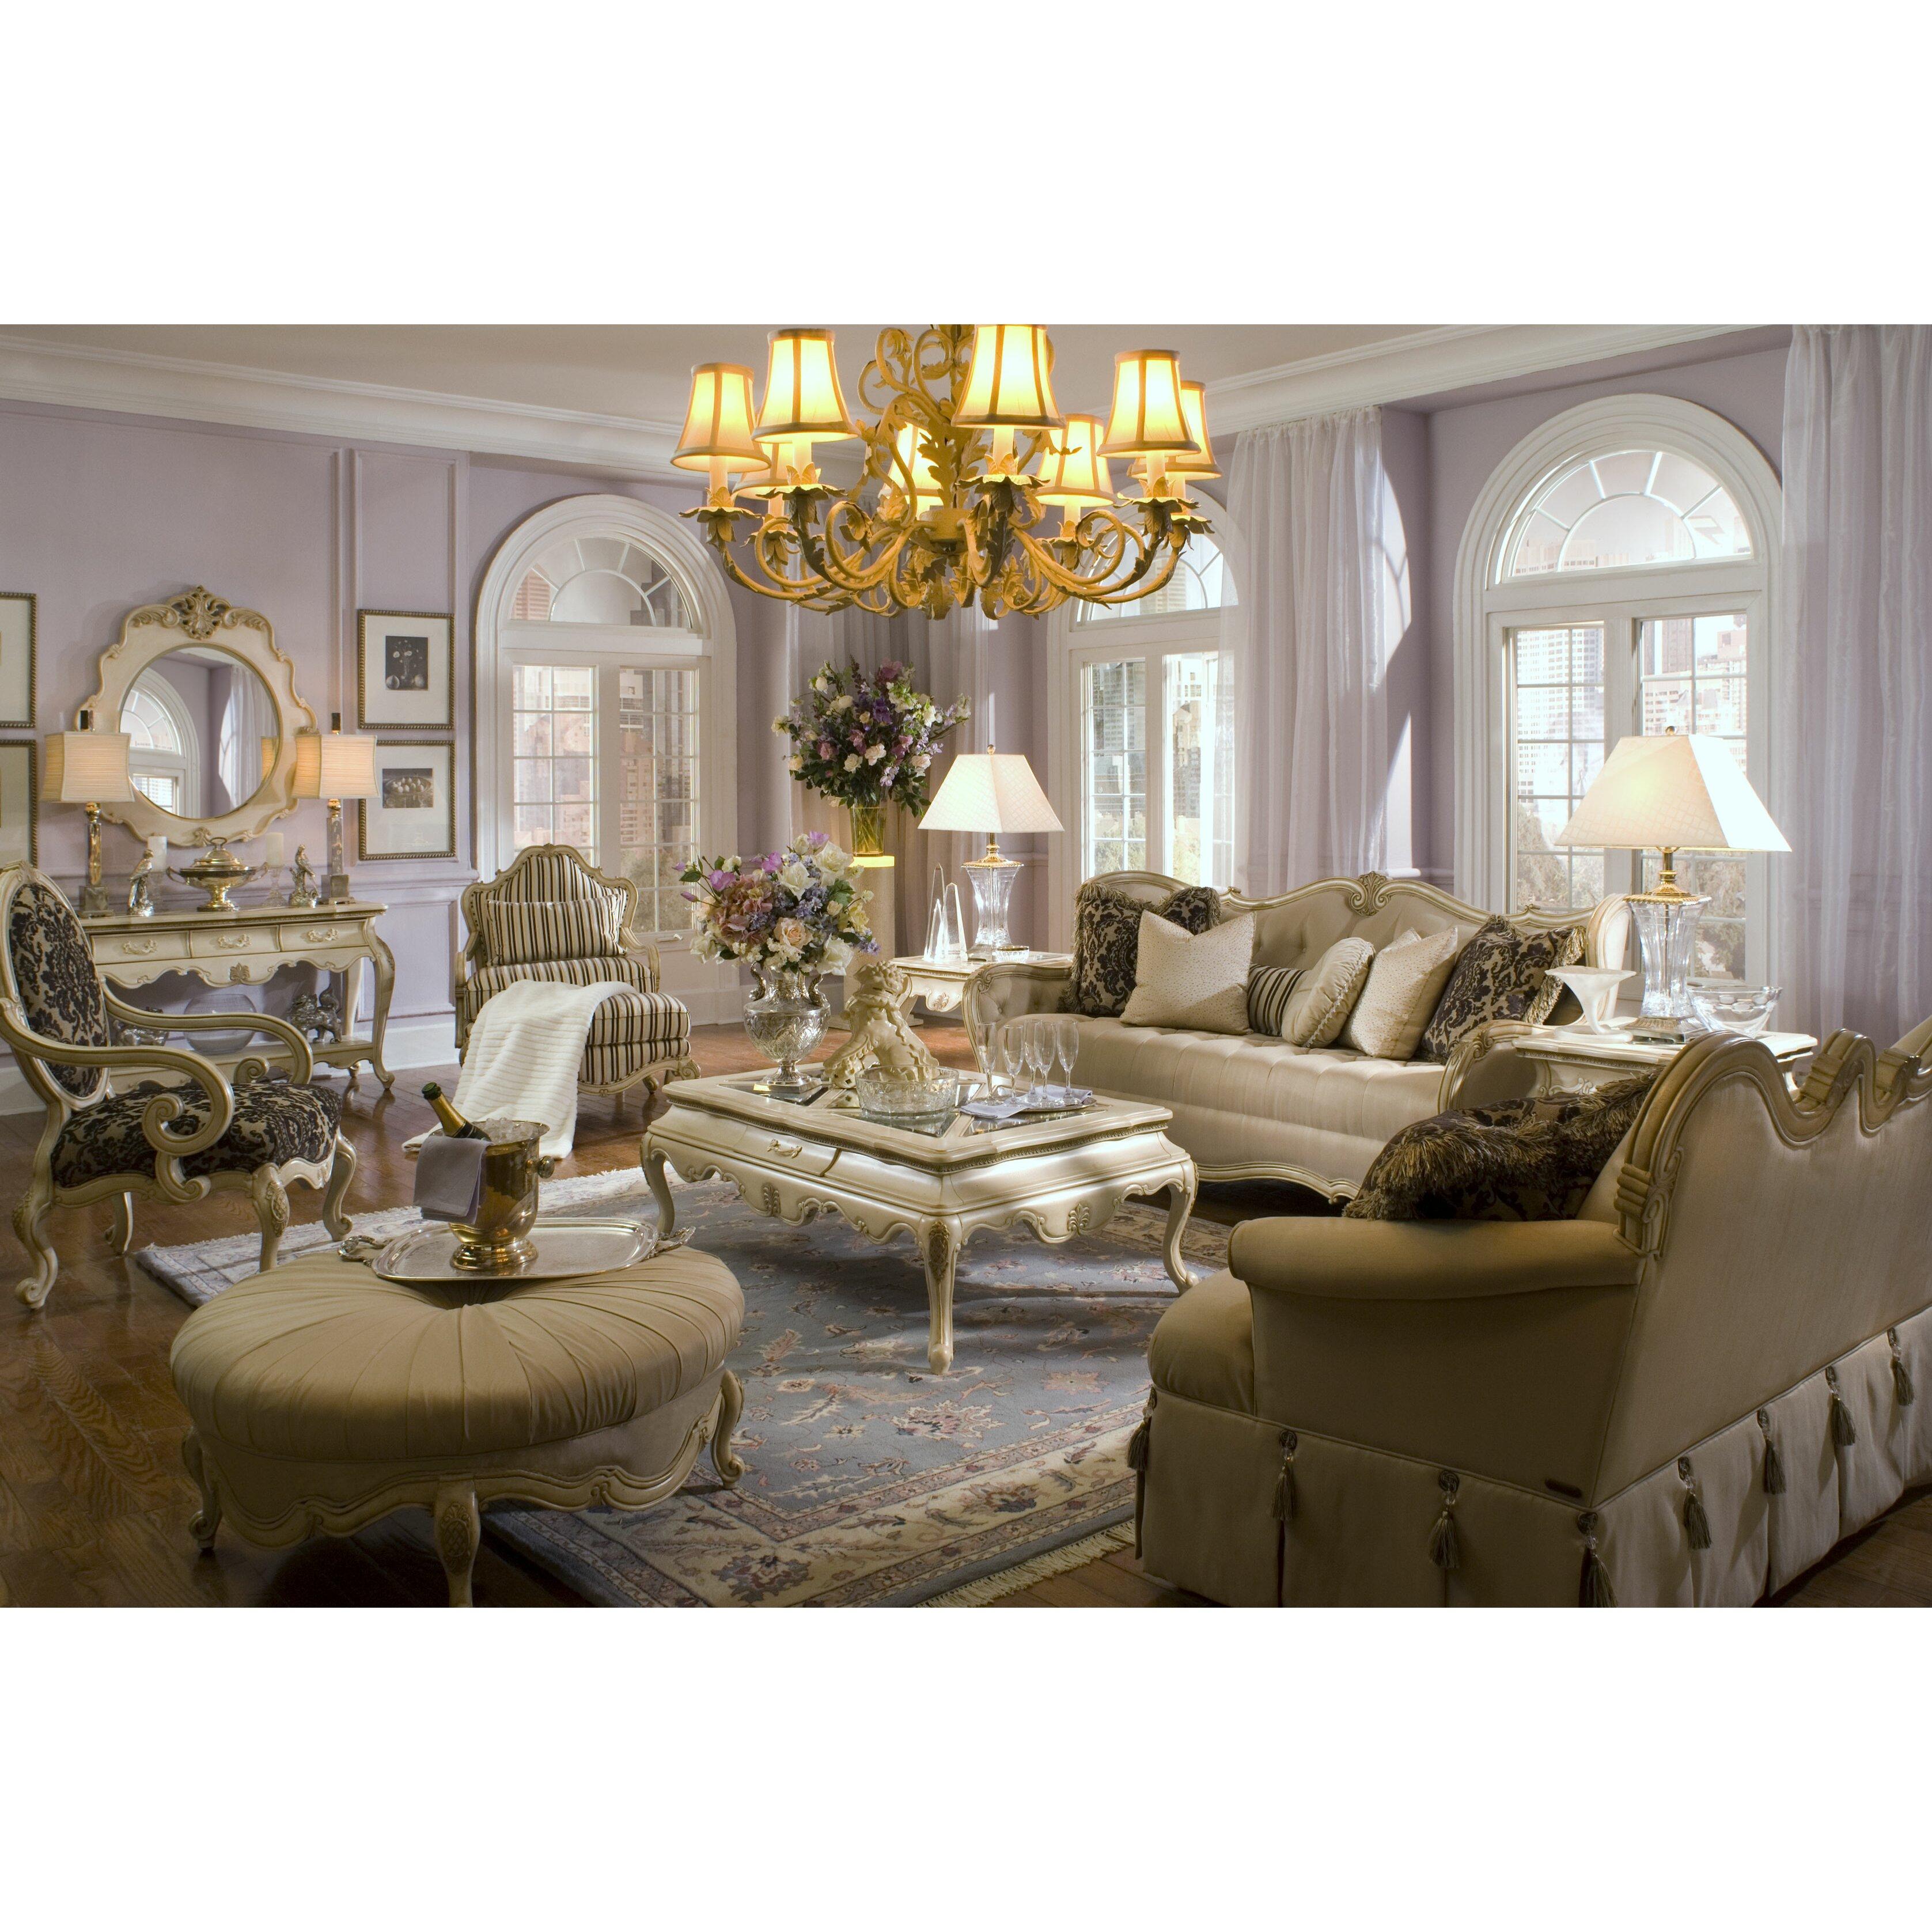 Michael Amini Living Room Set Michael Amini Lavelle Sofa And Settee Set Reviews Wayfair